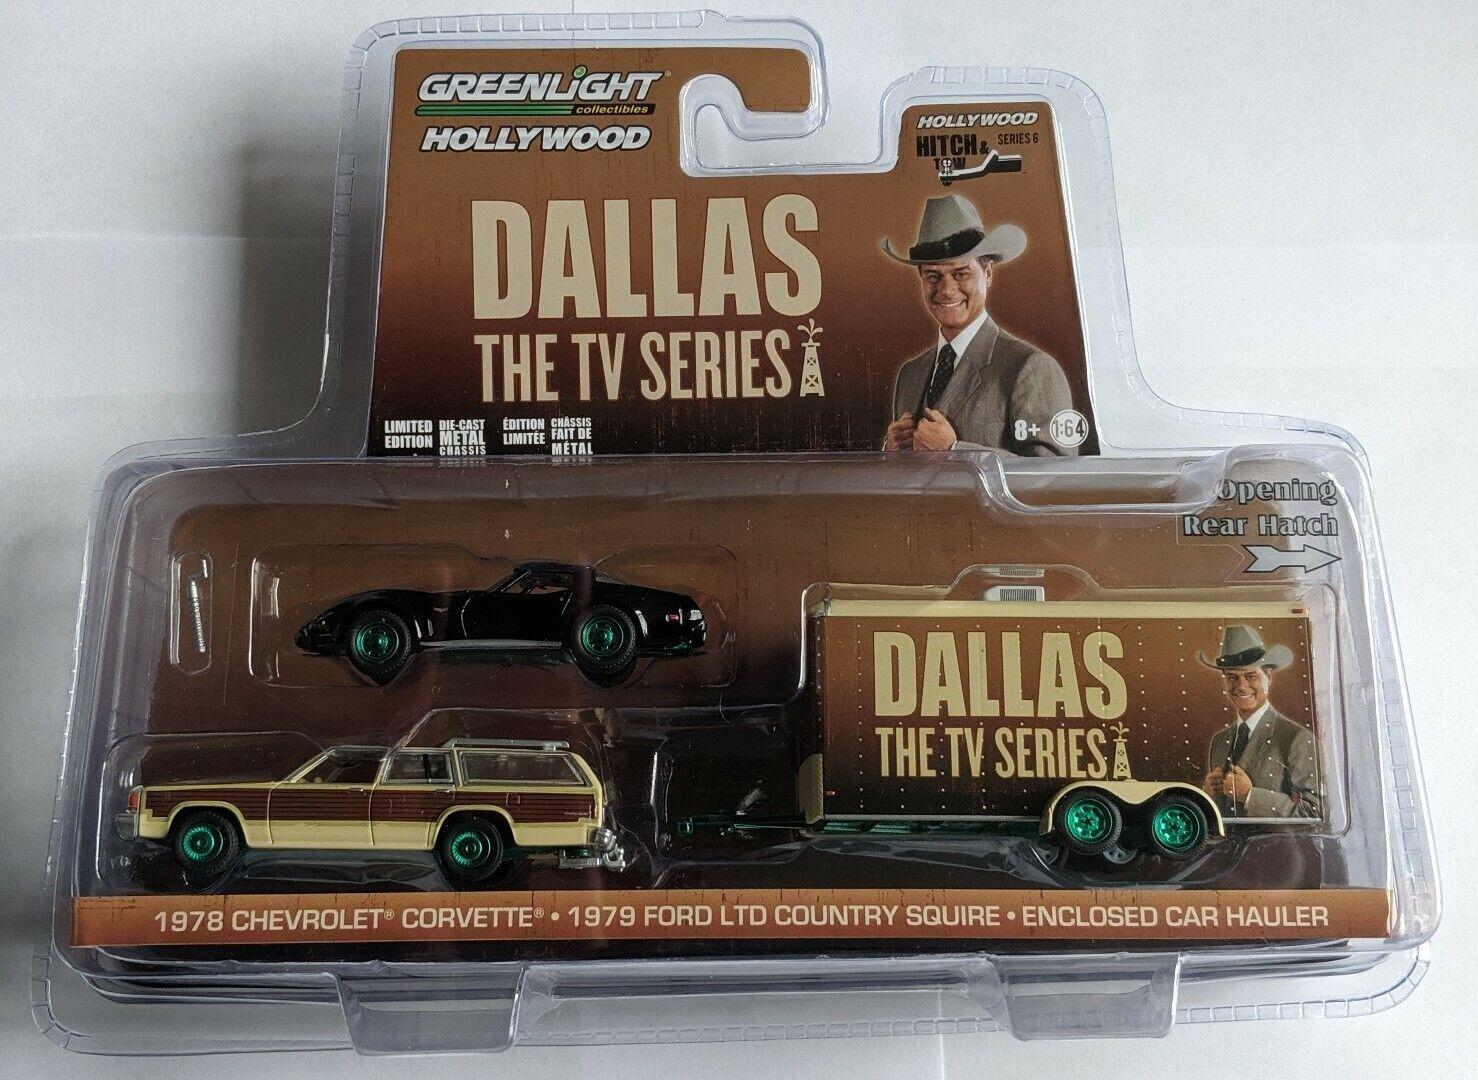 GREENLIGHT Hollywood 1958 Chevrolet corvette° 1979 Ford Ltd Country° En car haul